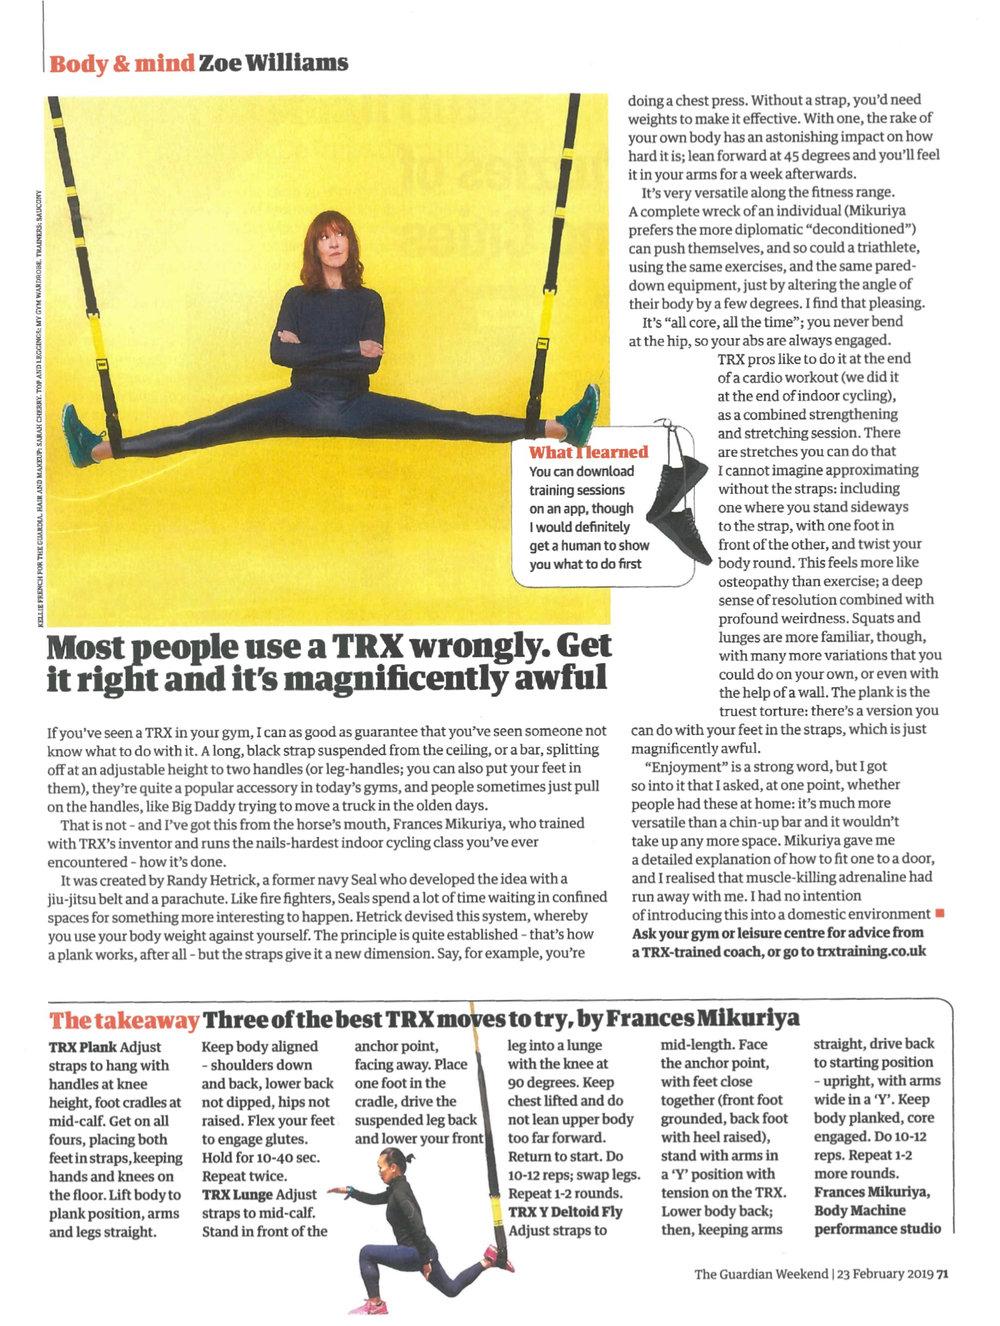 Guardian-Weekly-Magazine-Body-Machine-Kensington-London-TRX-Spinning.jpg